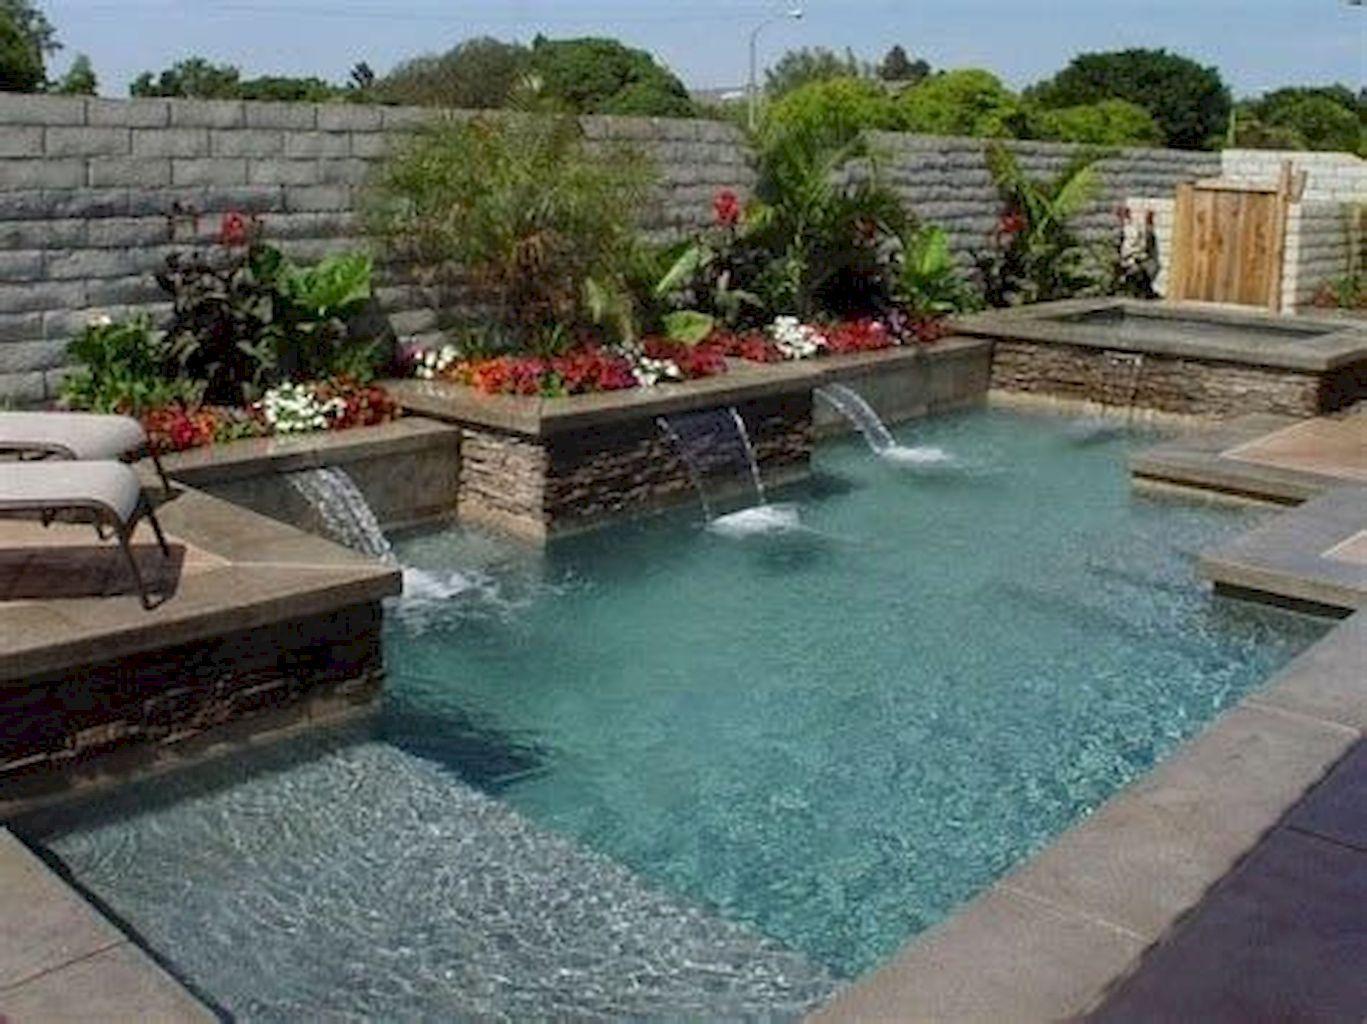 34 Good Inspiration Pool Draws Swimming Picture Neat Fast Rectangular Pool Backyard Pool Landscaping Small Backyard Pools